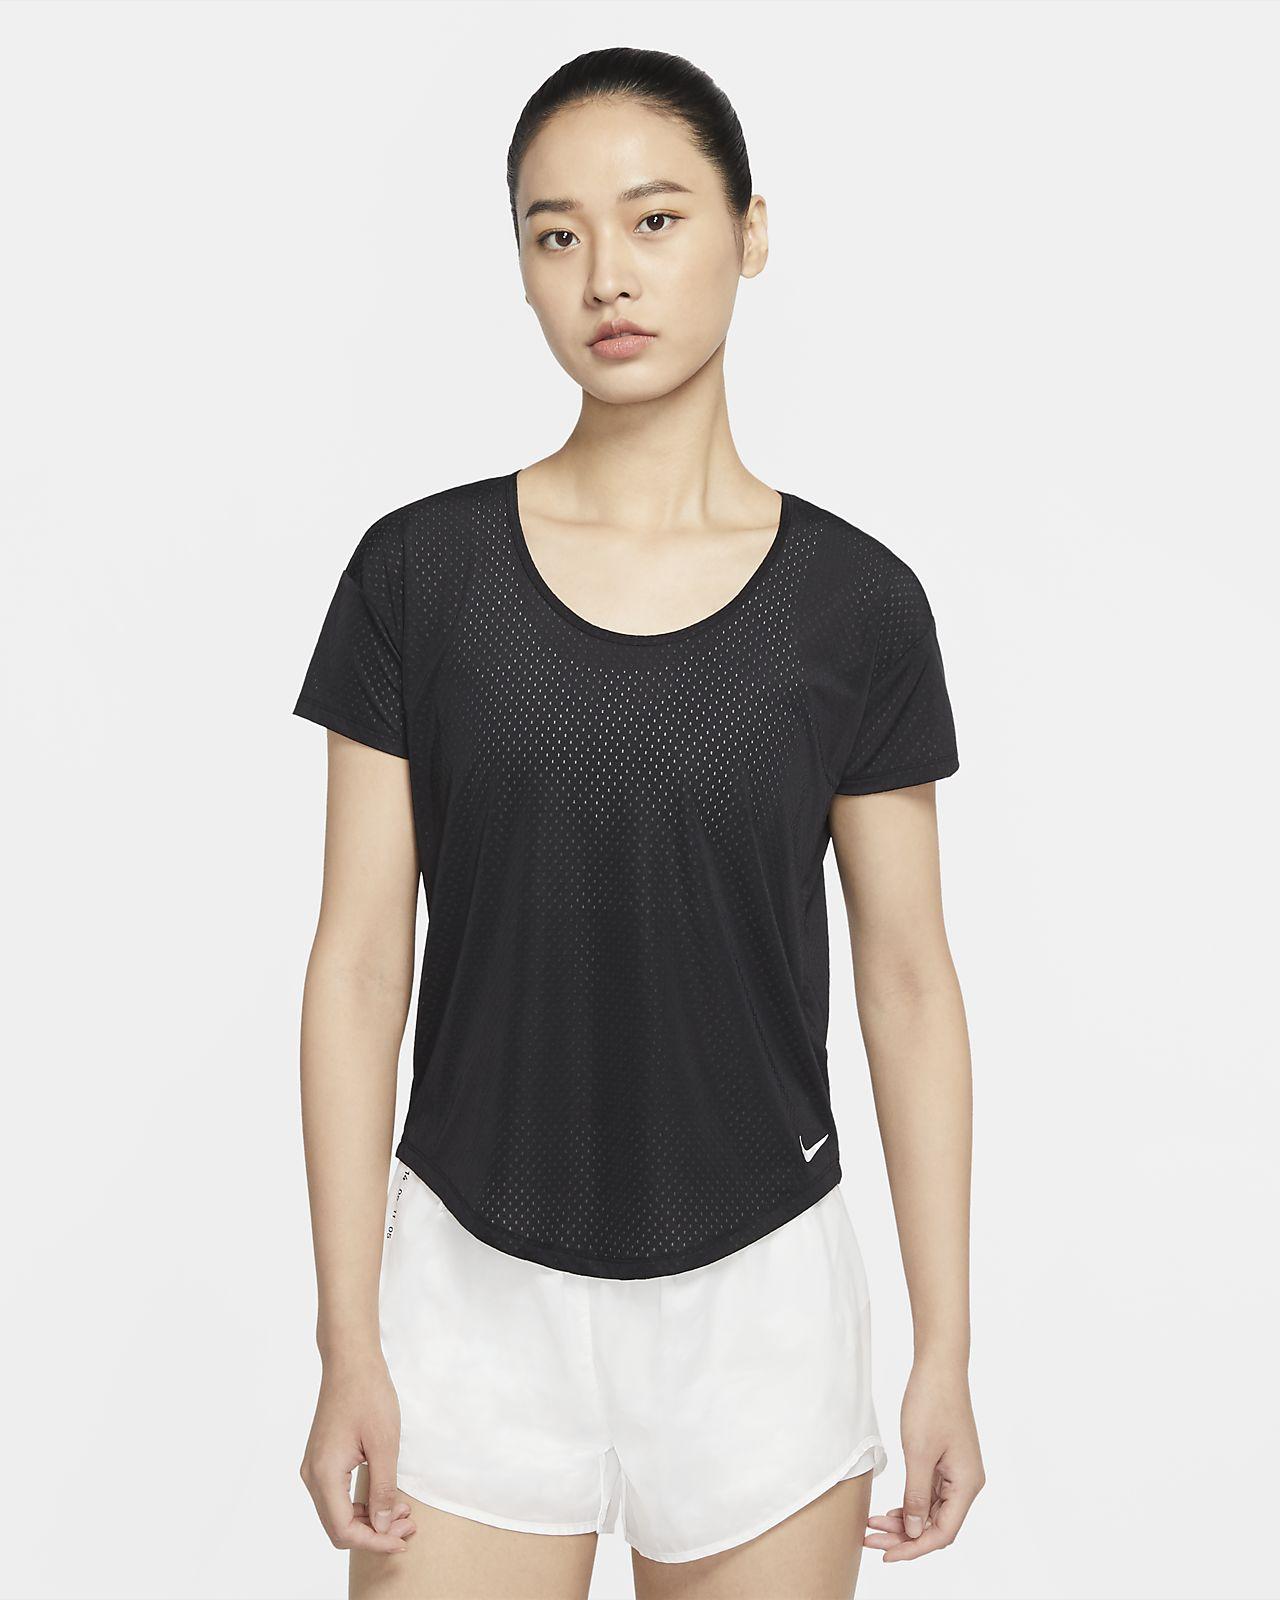 Nike Breathe 女子短袖跑步上衣